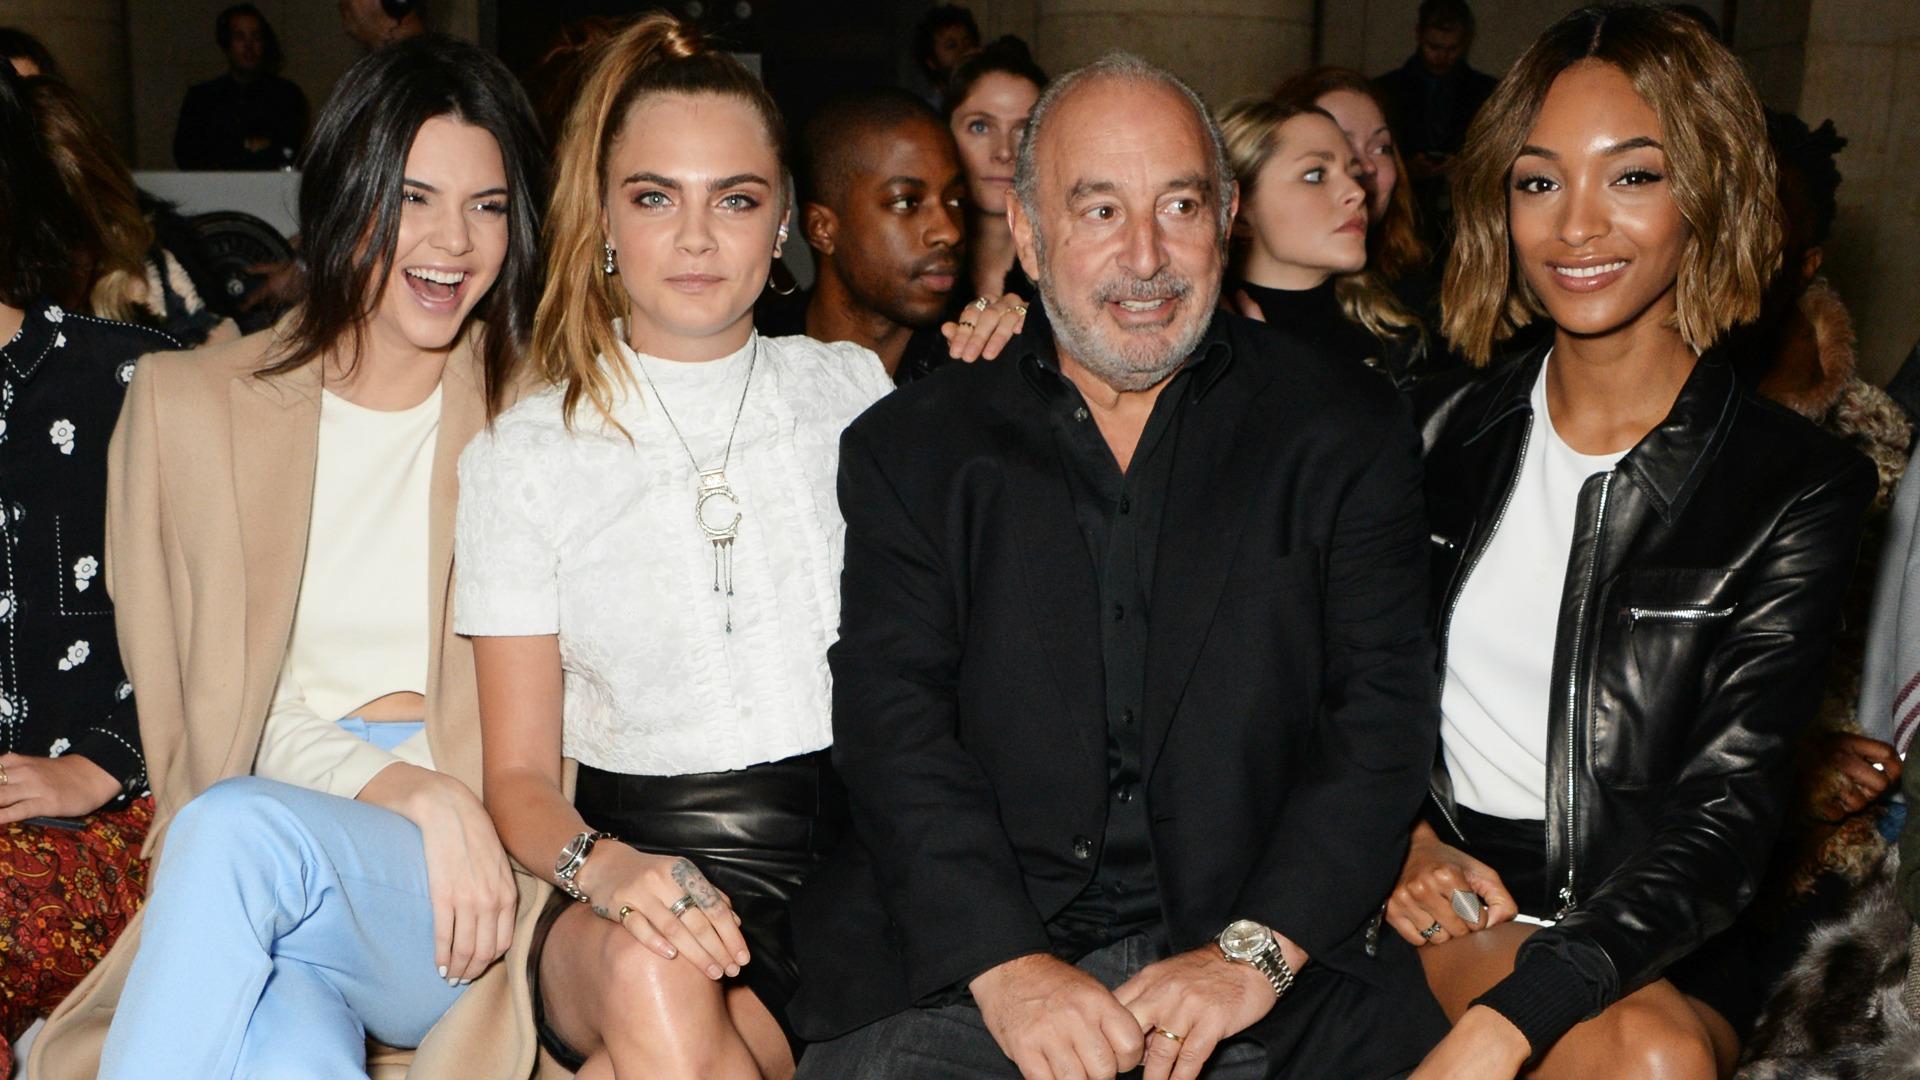 Front row at London Fashion Week AW15